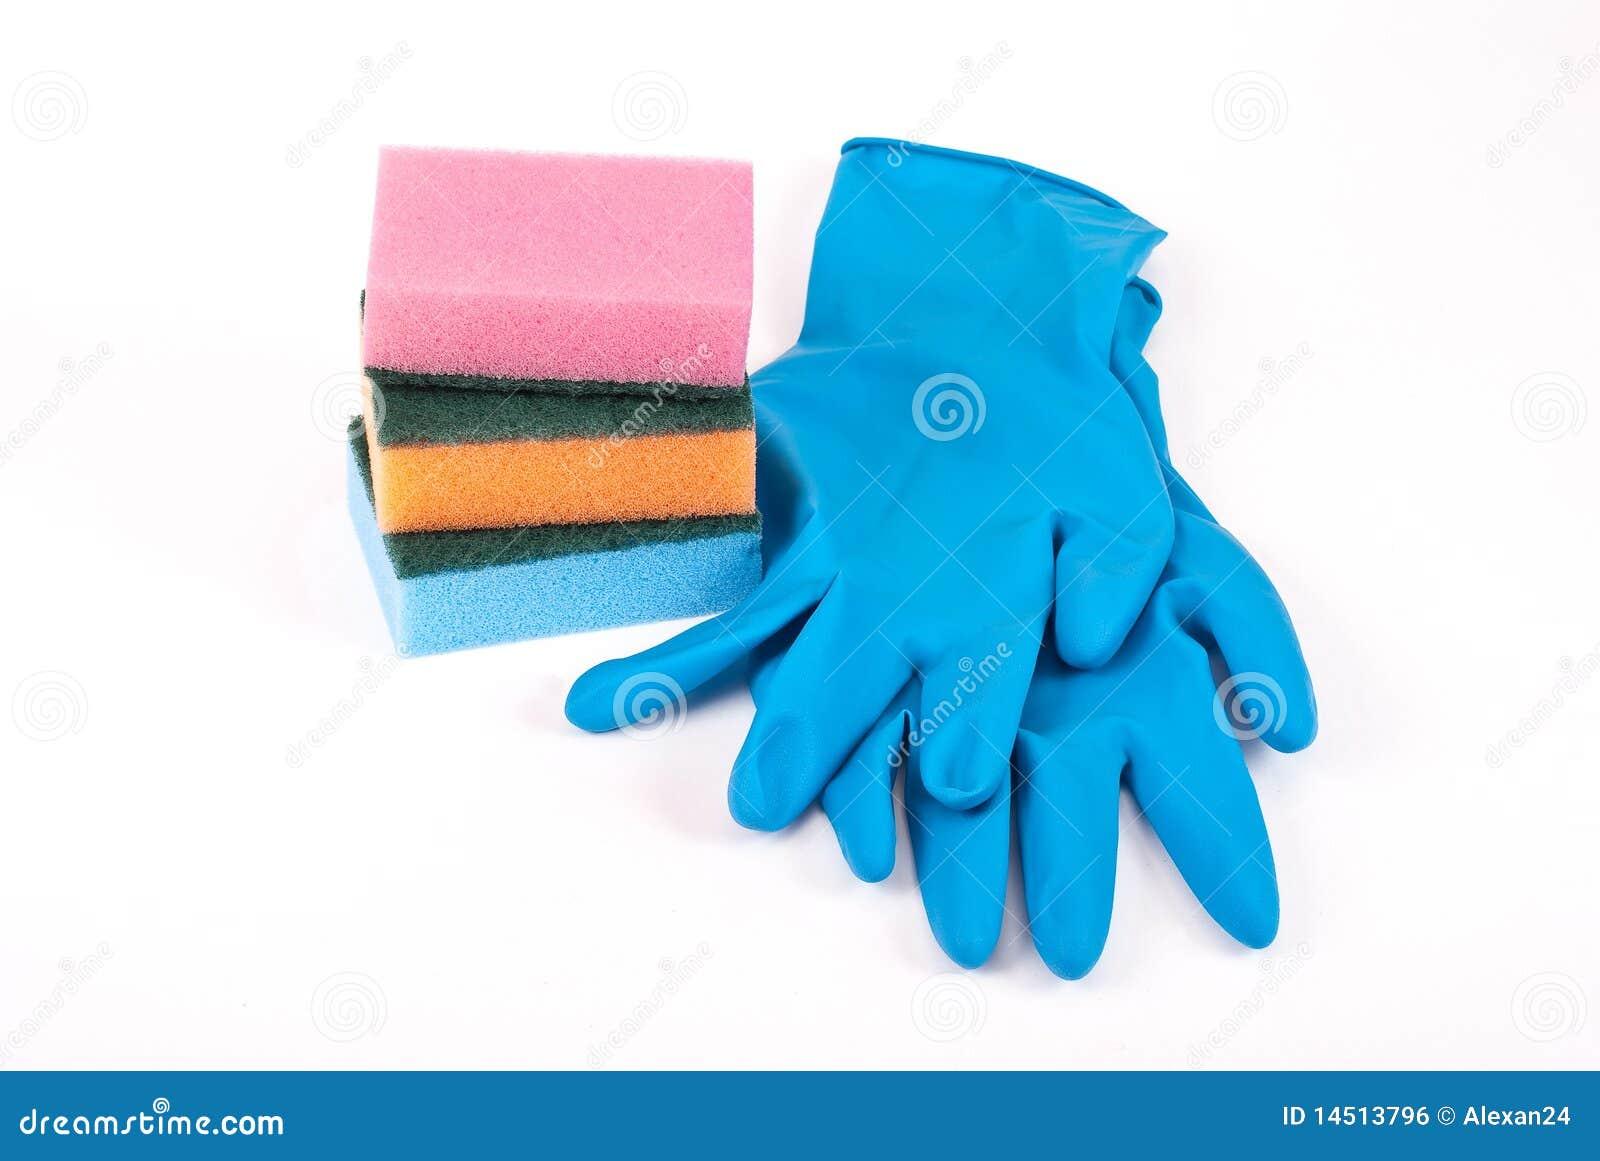 Free downloads software glove